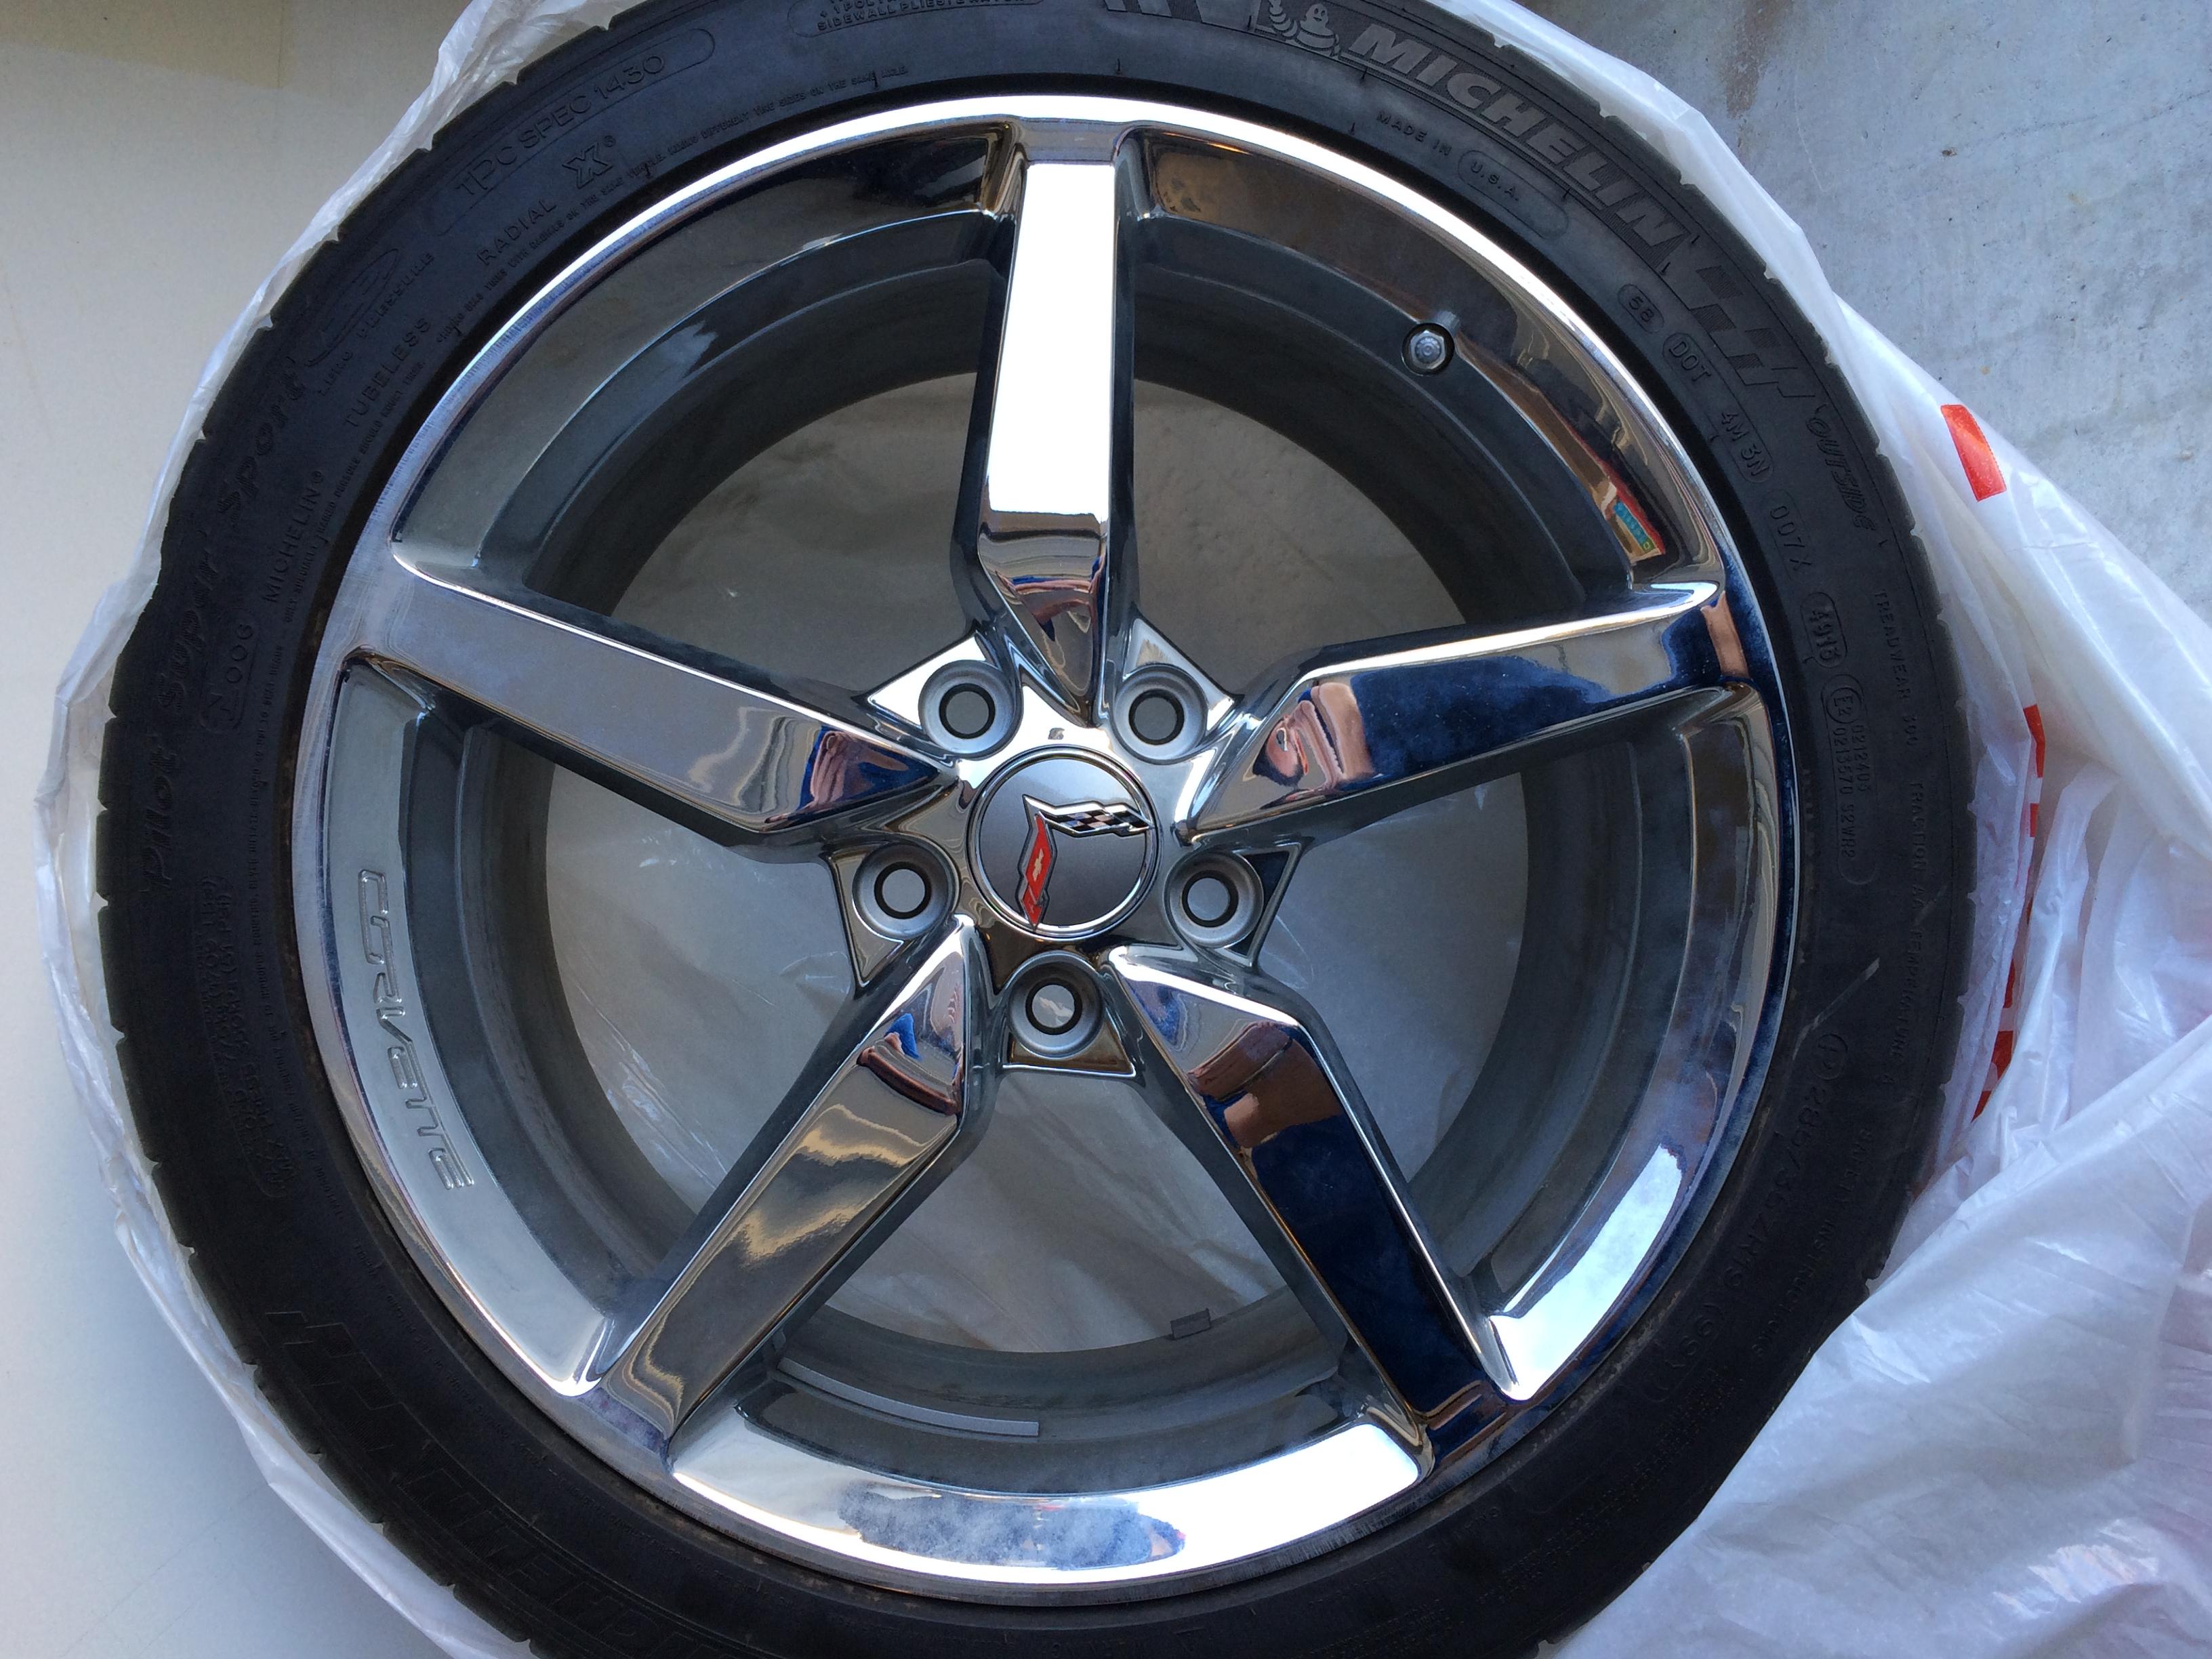 2014 Corvette Stingray Black Chrome Wheels 2014 corvette stingray